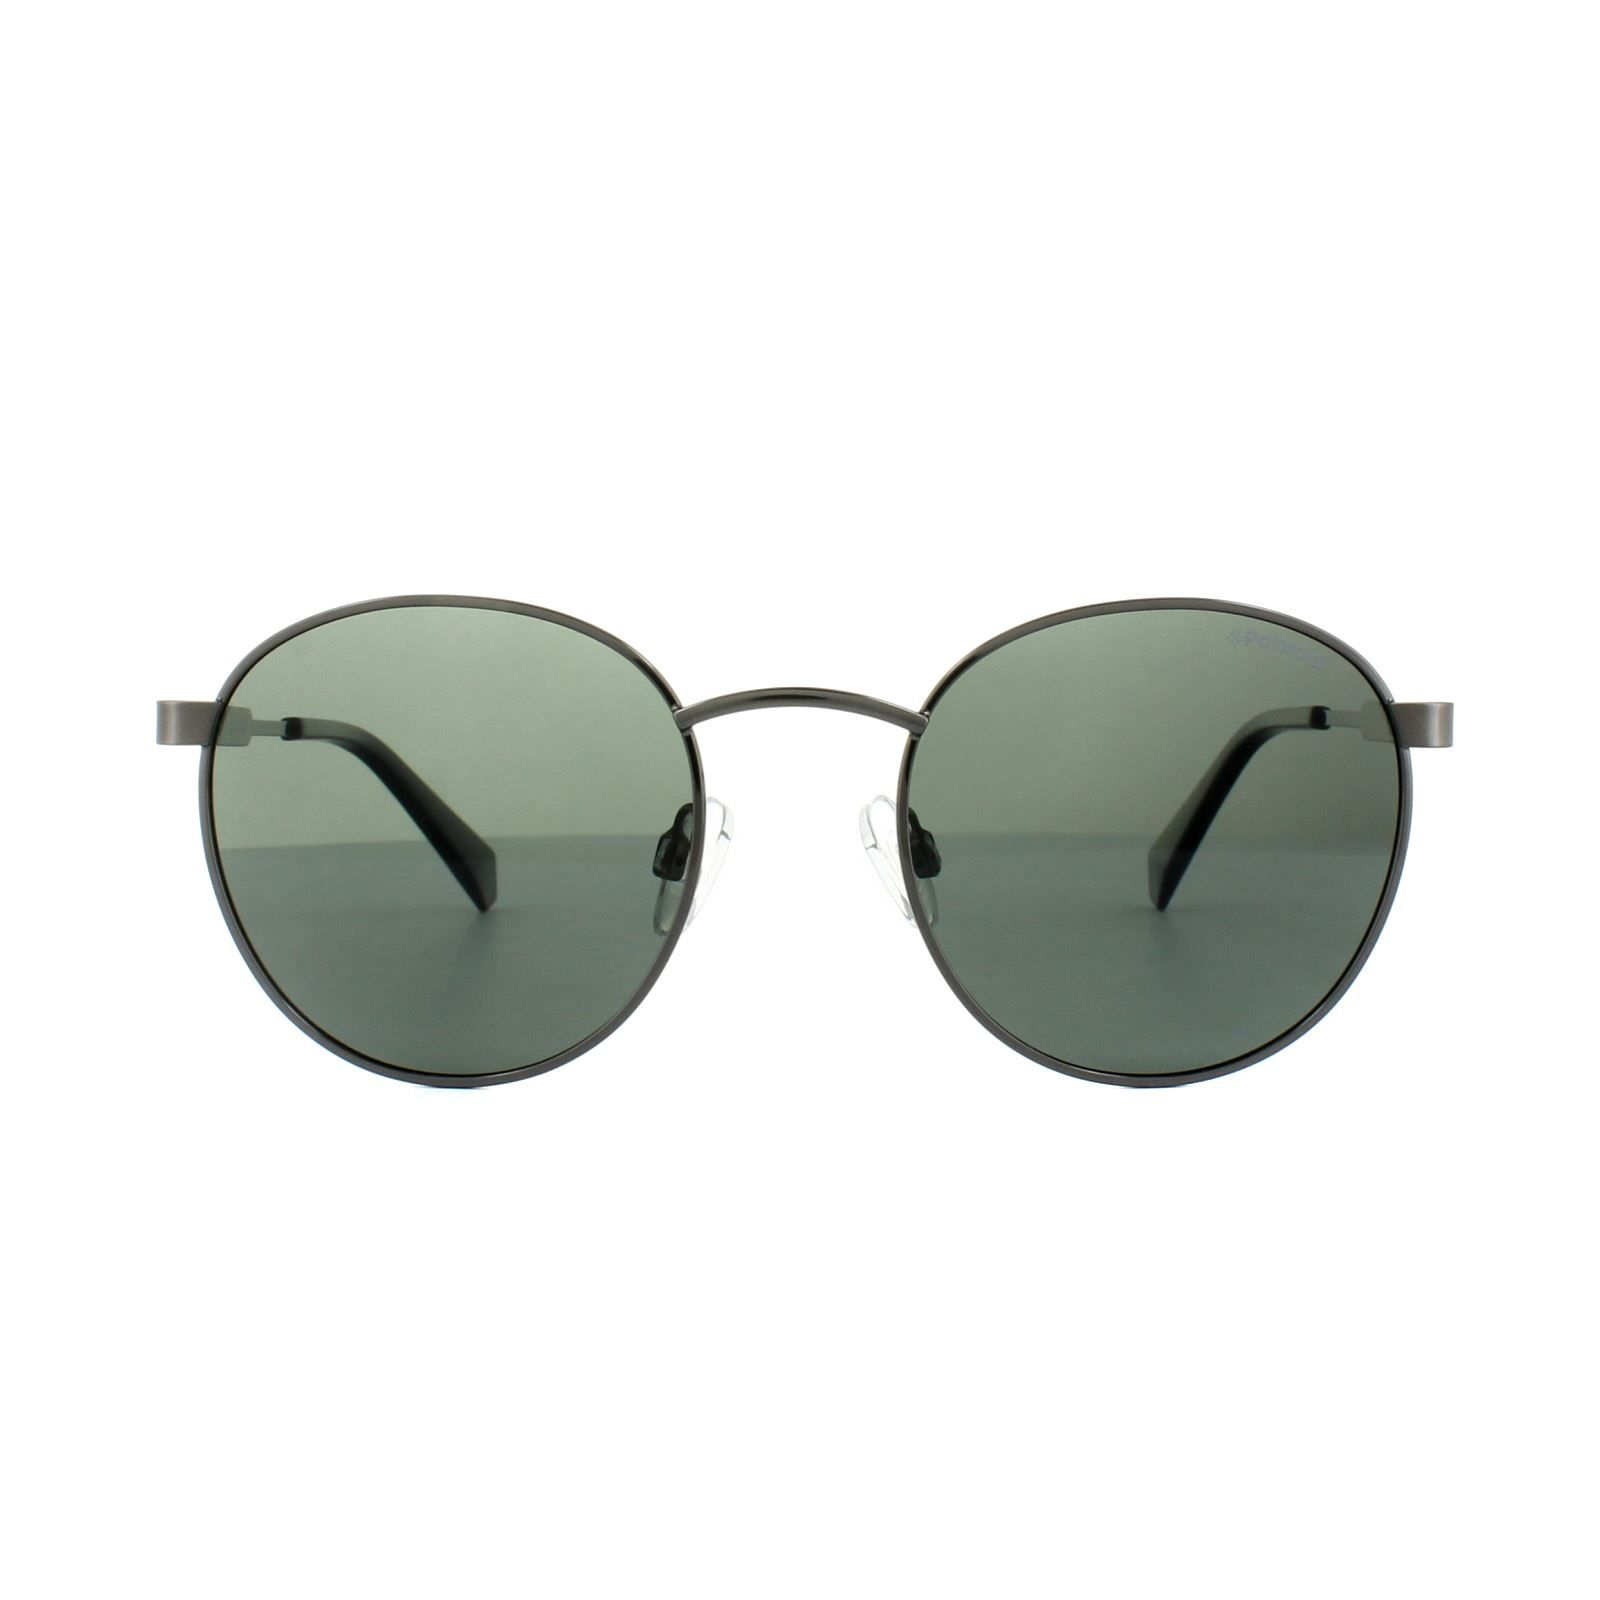 Polaroid Sunglasses PLD 2053/S KJ1 UC Dark Ruthenium Green Polarized